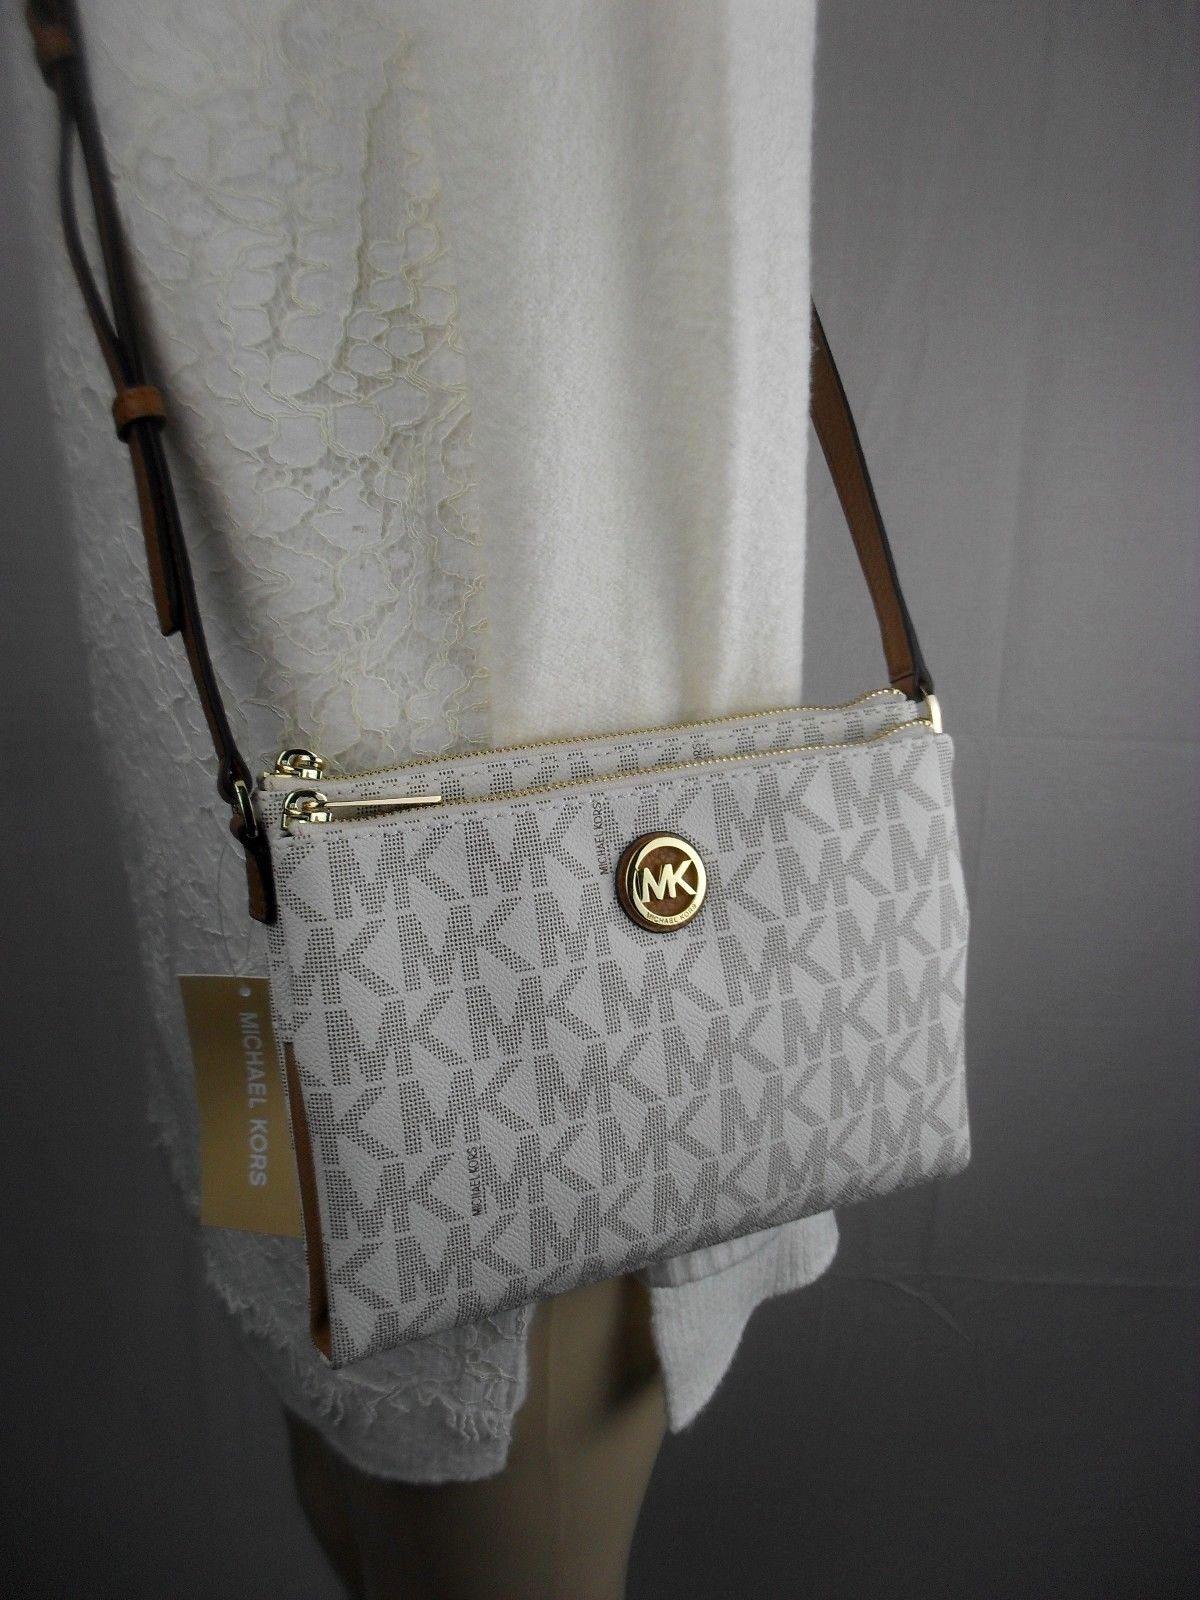 984636f48bd9 NWT Michael Kors Vanilla Fulton Large EW Crossbody PVC Handbag MK Messenger  Bag